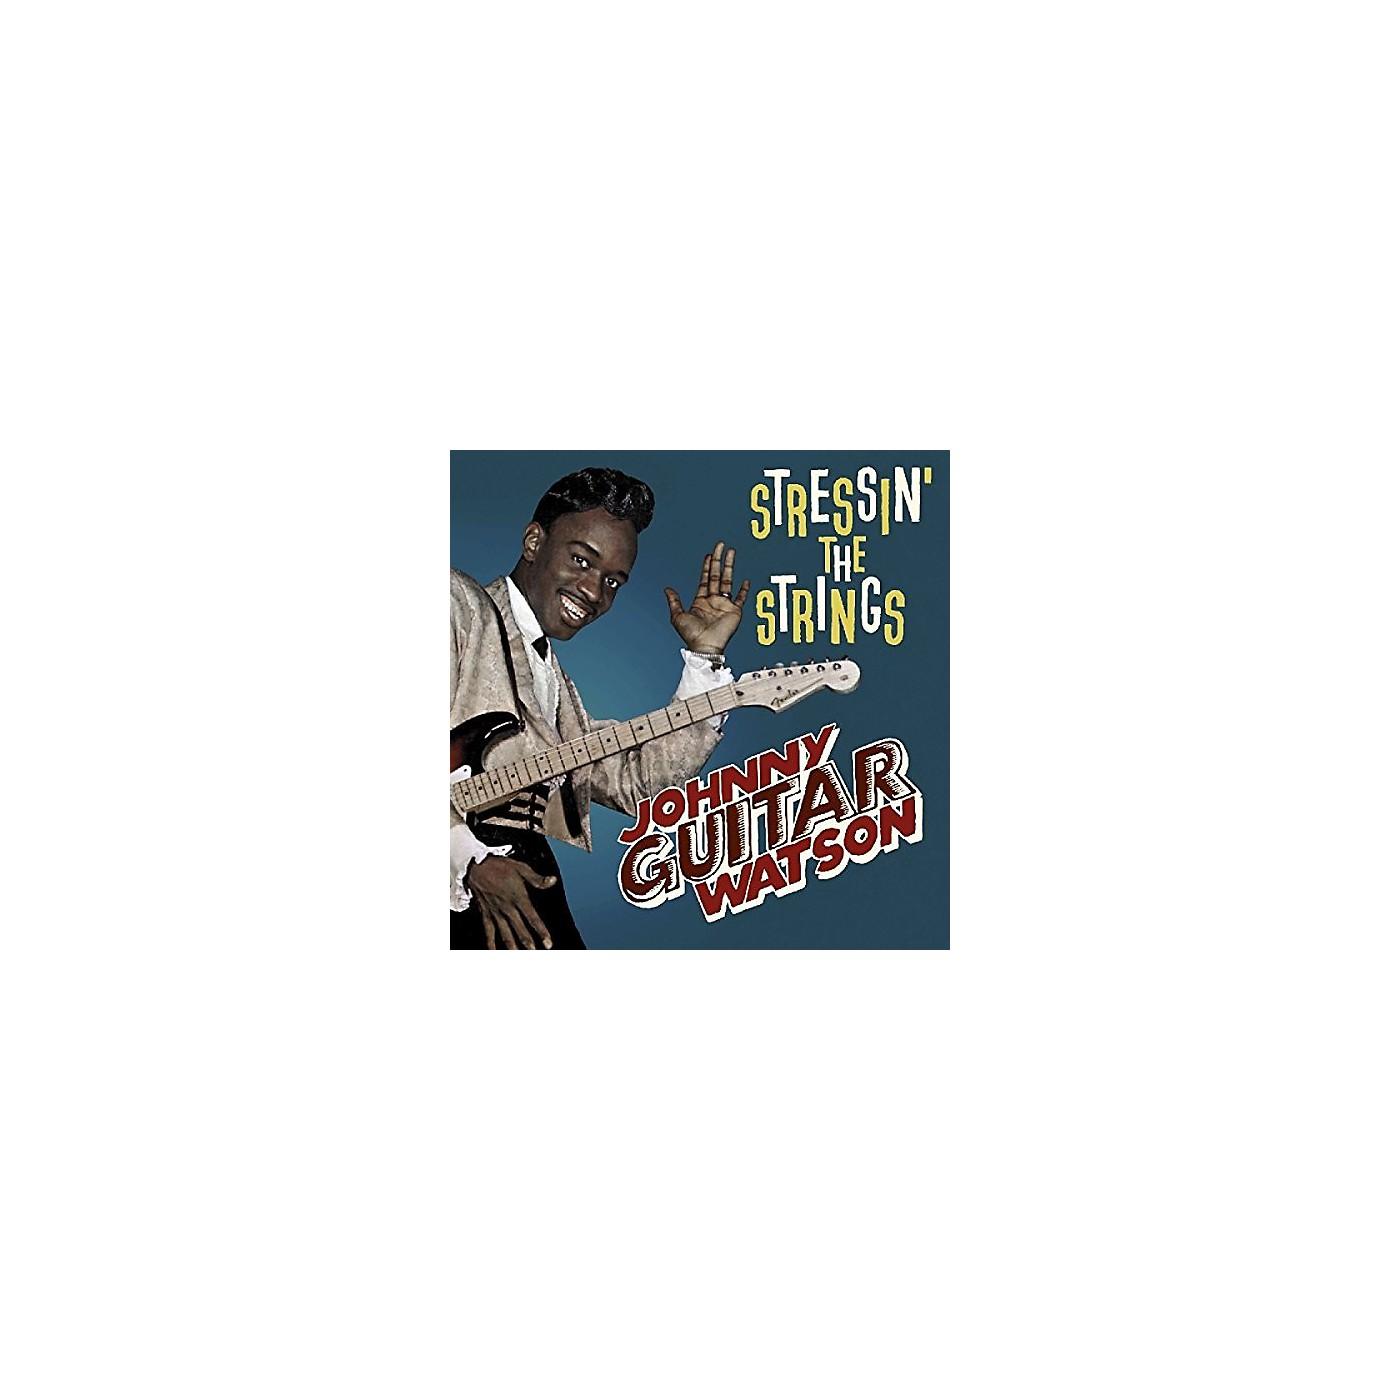 Alliance Johnny Guitar Watson - Stressin' The Strings thumbnail